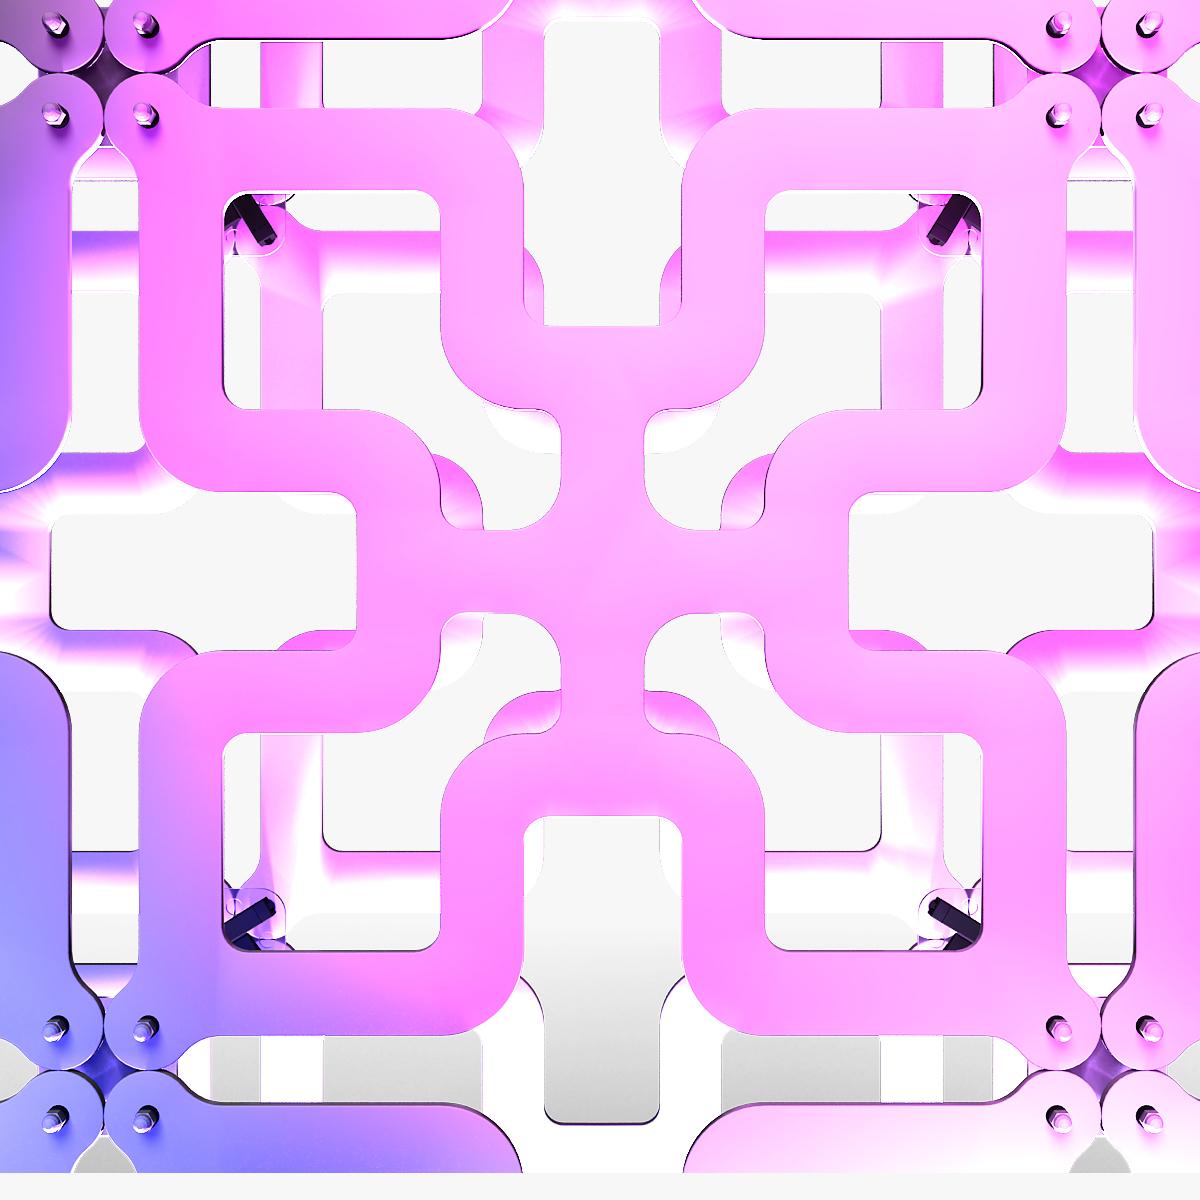 70-05-07-1200x1200.jpg Download STL file Stage Decor Collection 01 (Modular 9 Pieces) • 3D printer model, akerStudio